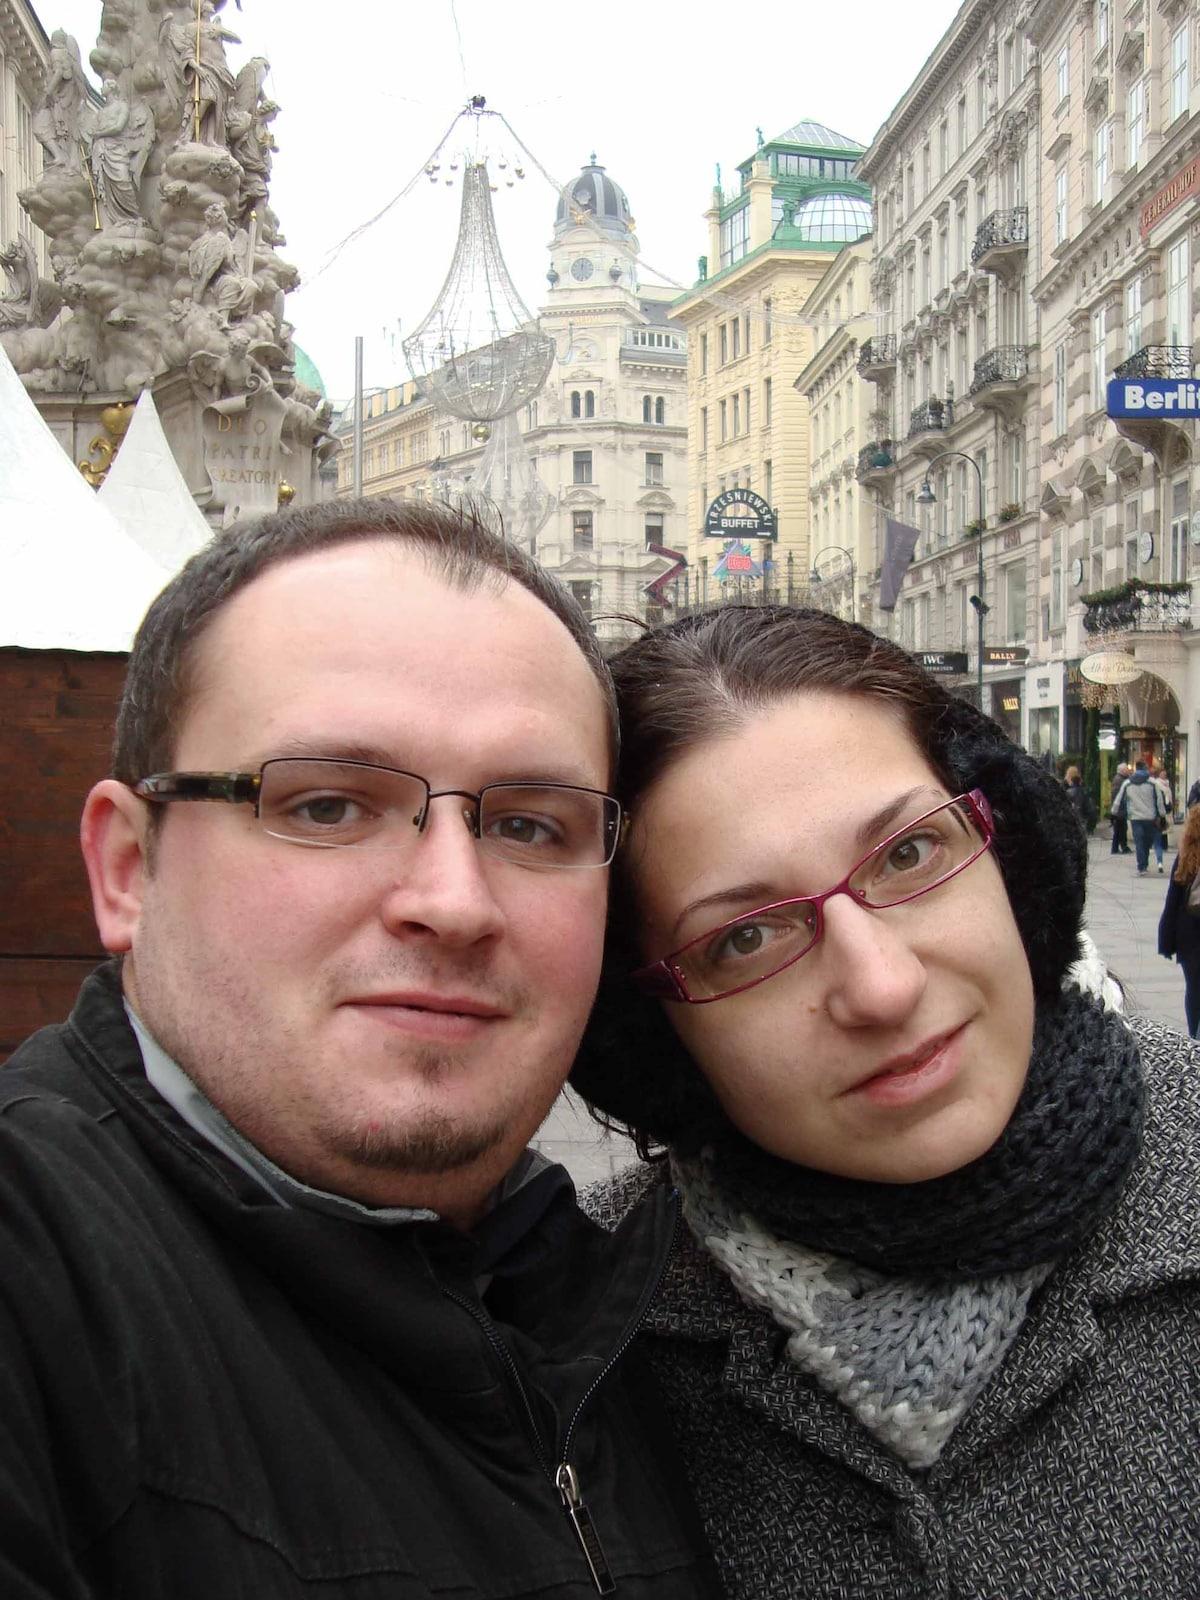 Marina&Tomislav from Zagreb